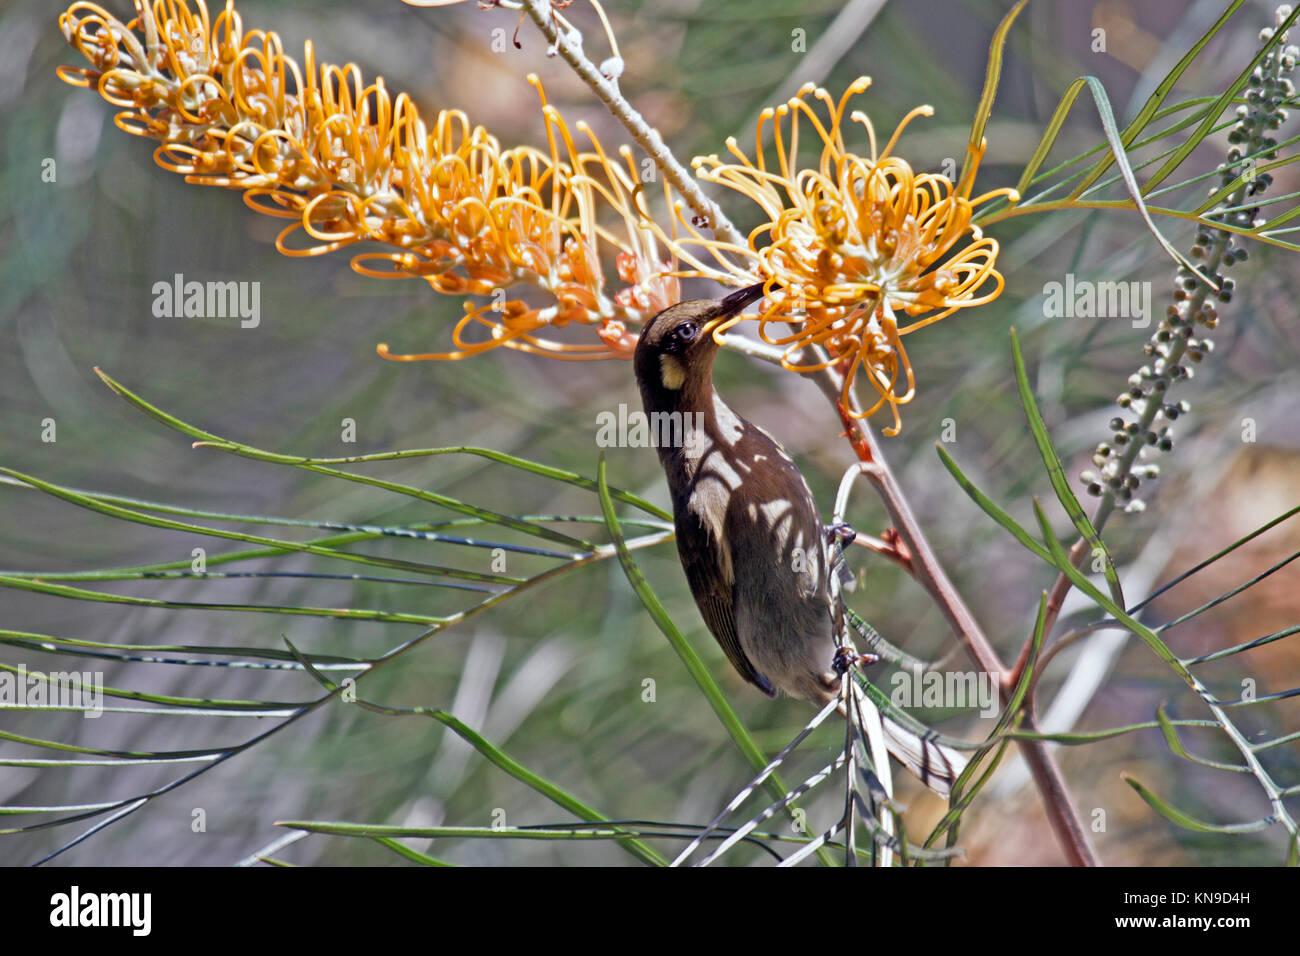 Graceful honeyeater feeding at blossoms of flowering shrub in Queensland Australia - Stock Image